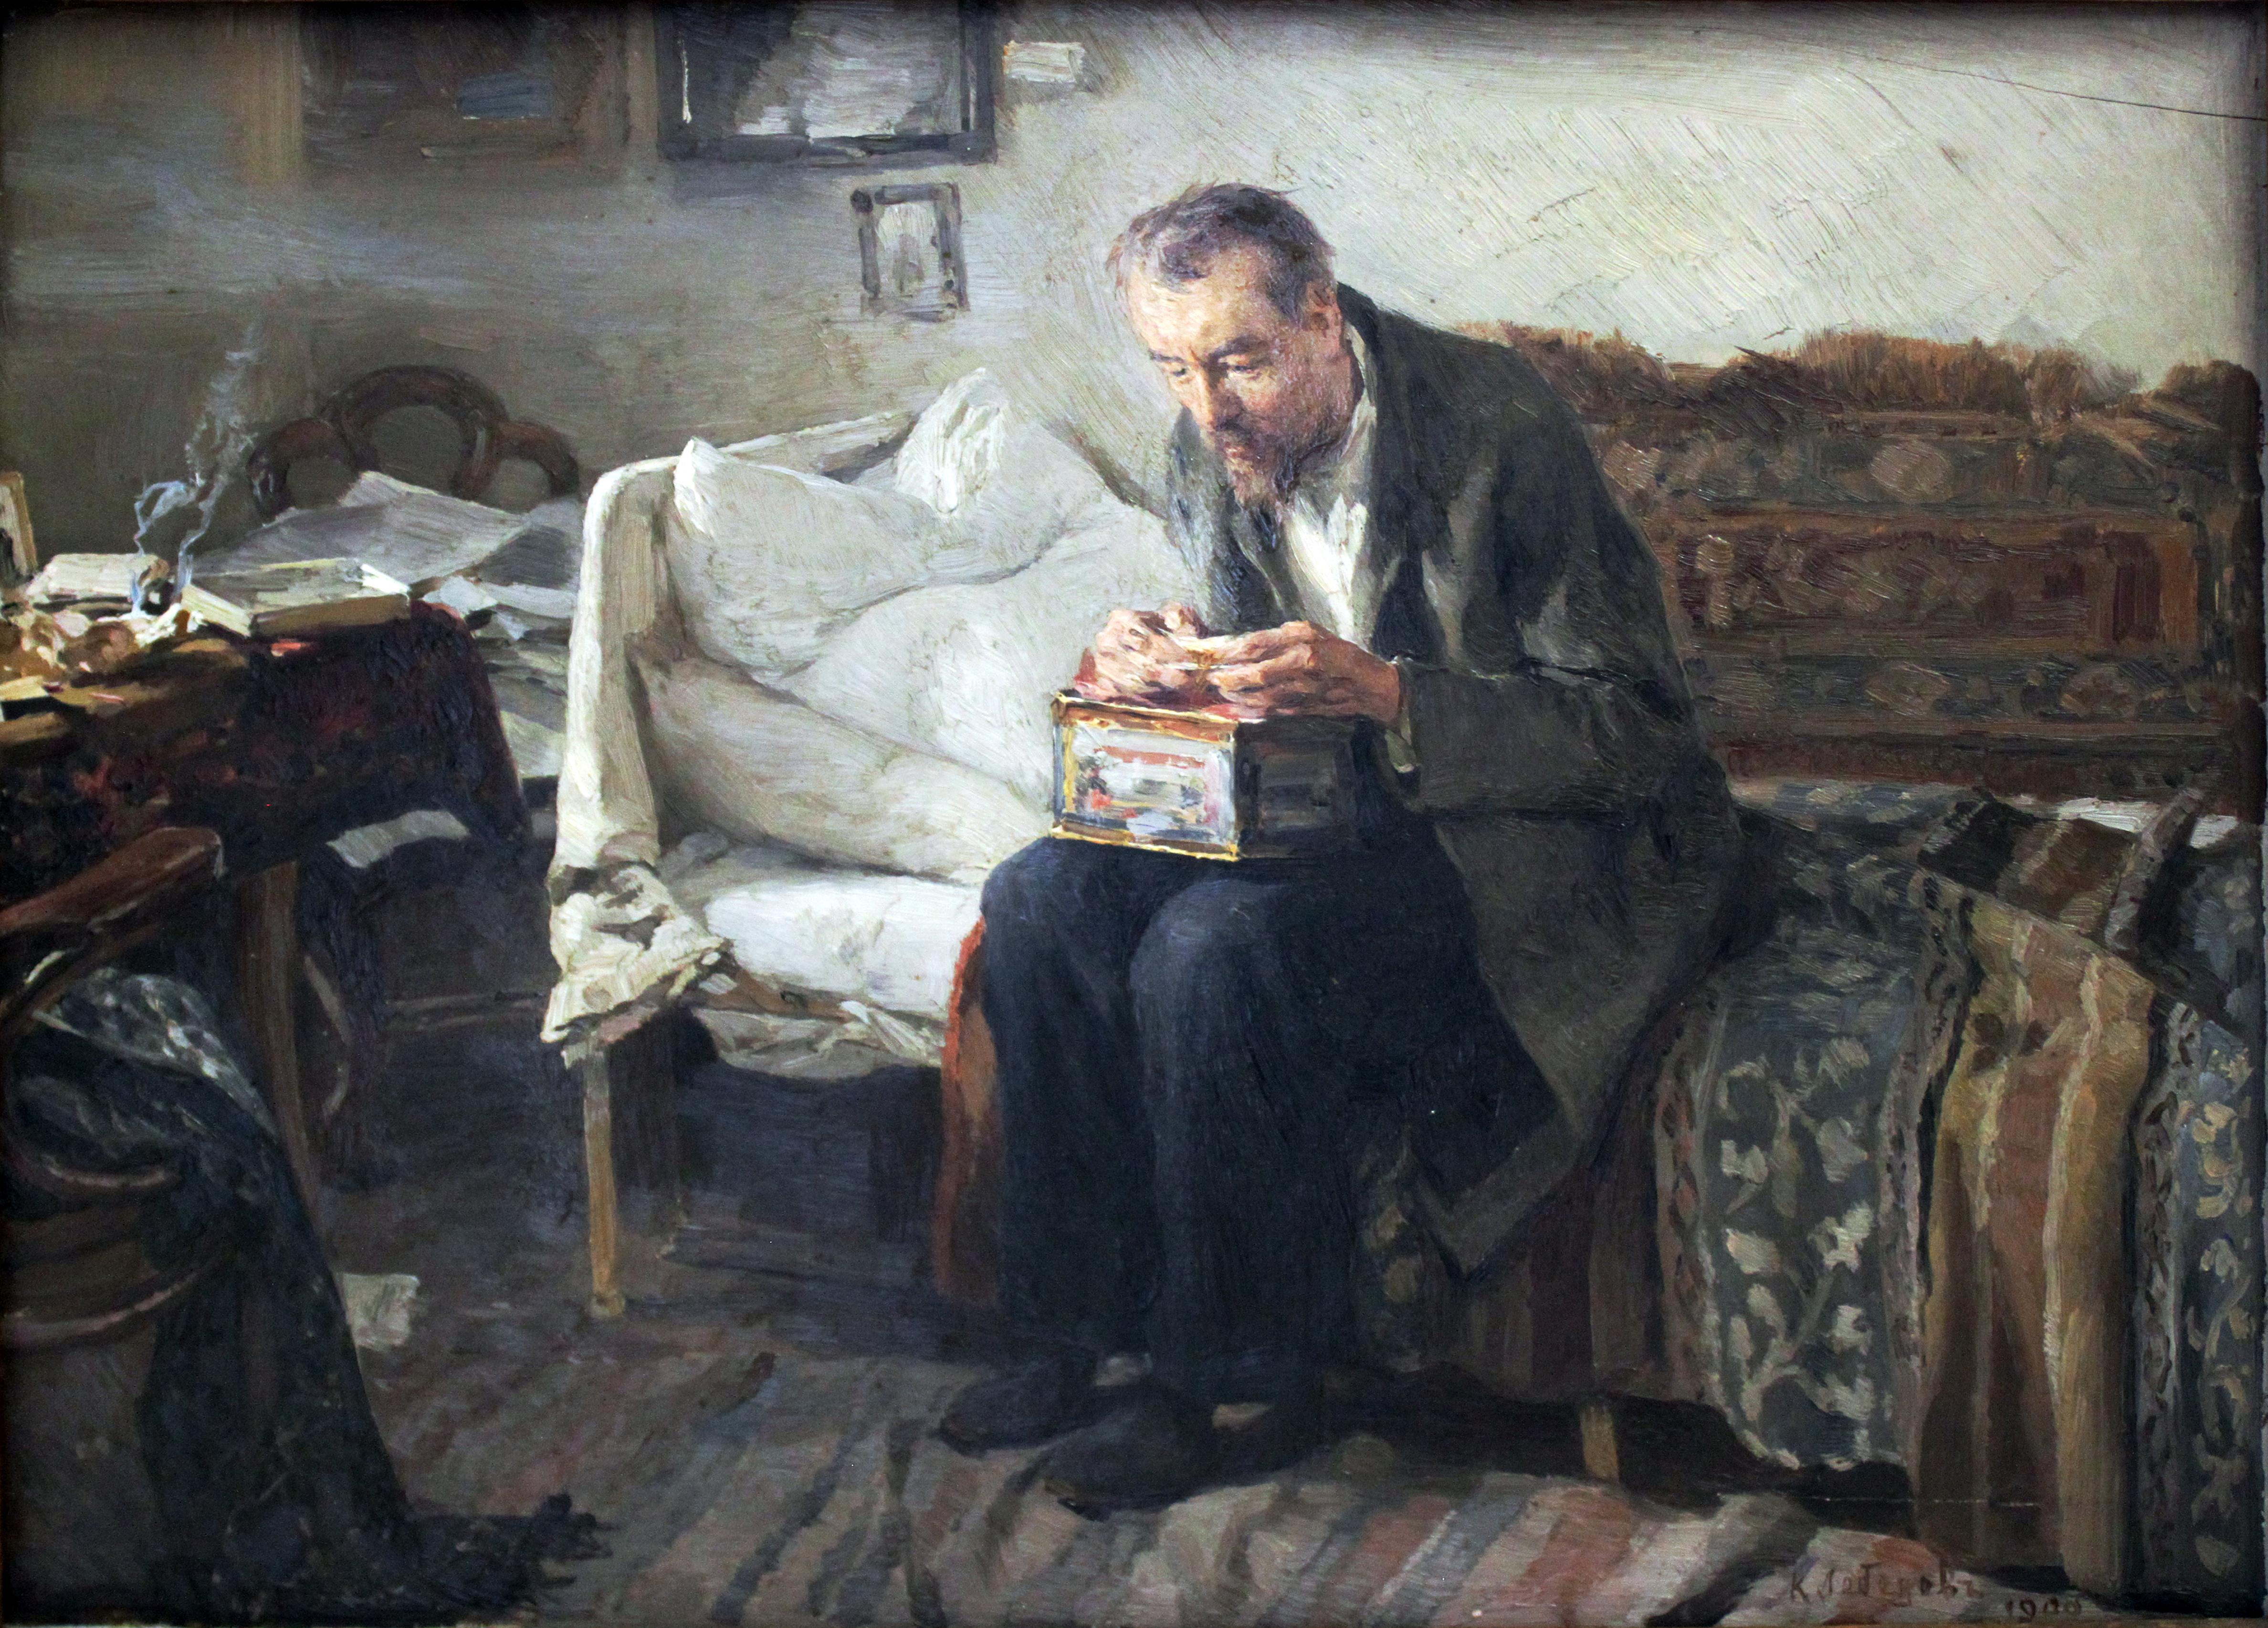 Холостяк Wikipedia: File:1900 Lebedev Hagestolz Anagoria.JPG